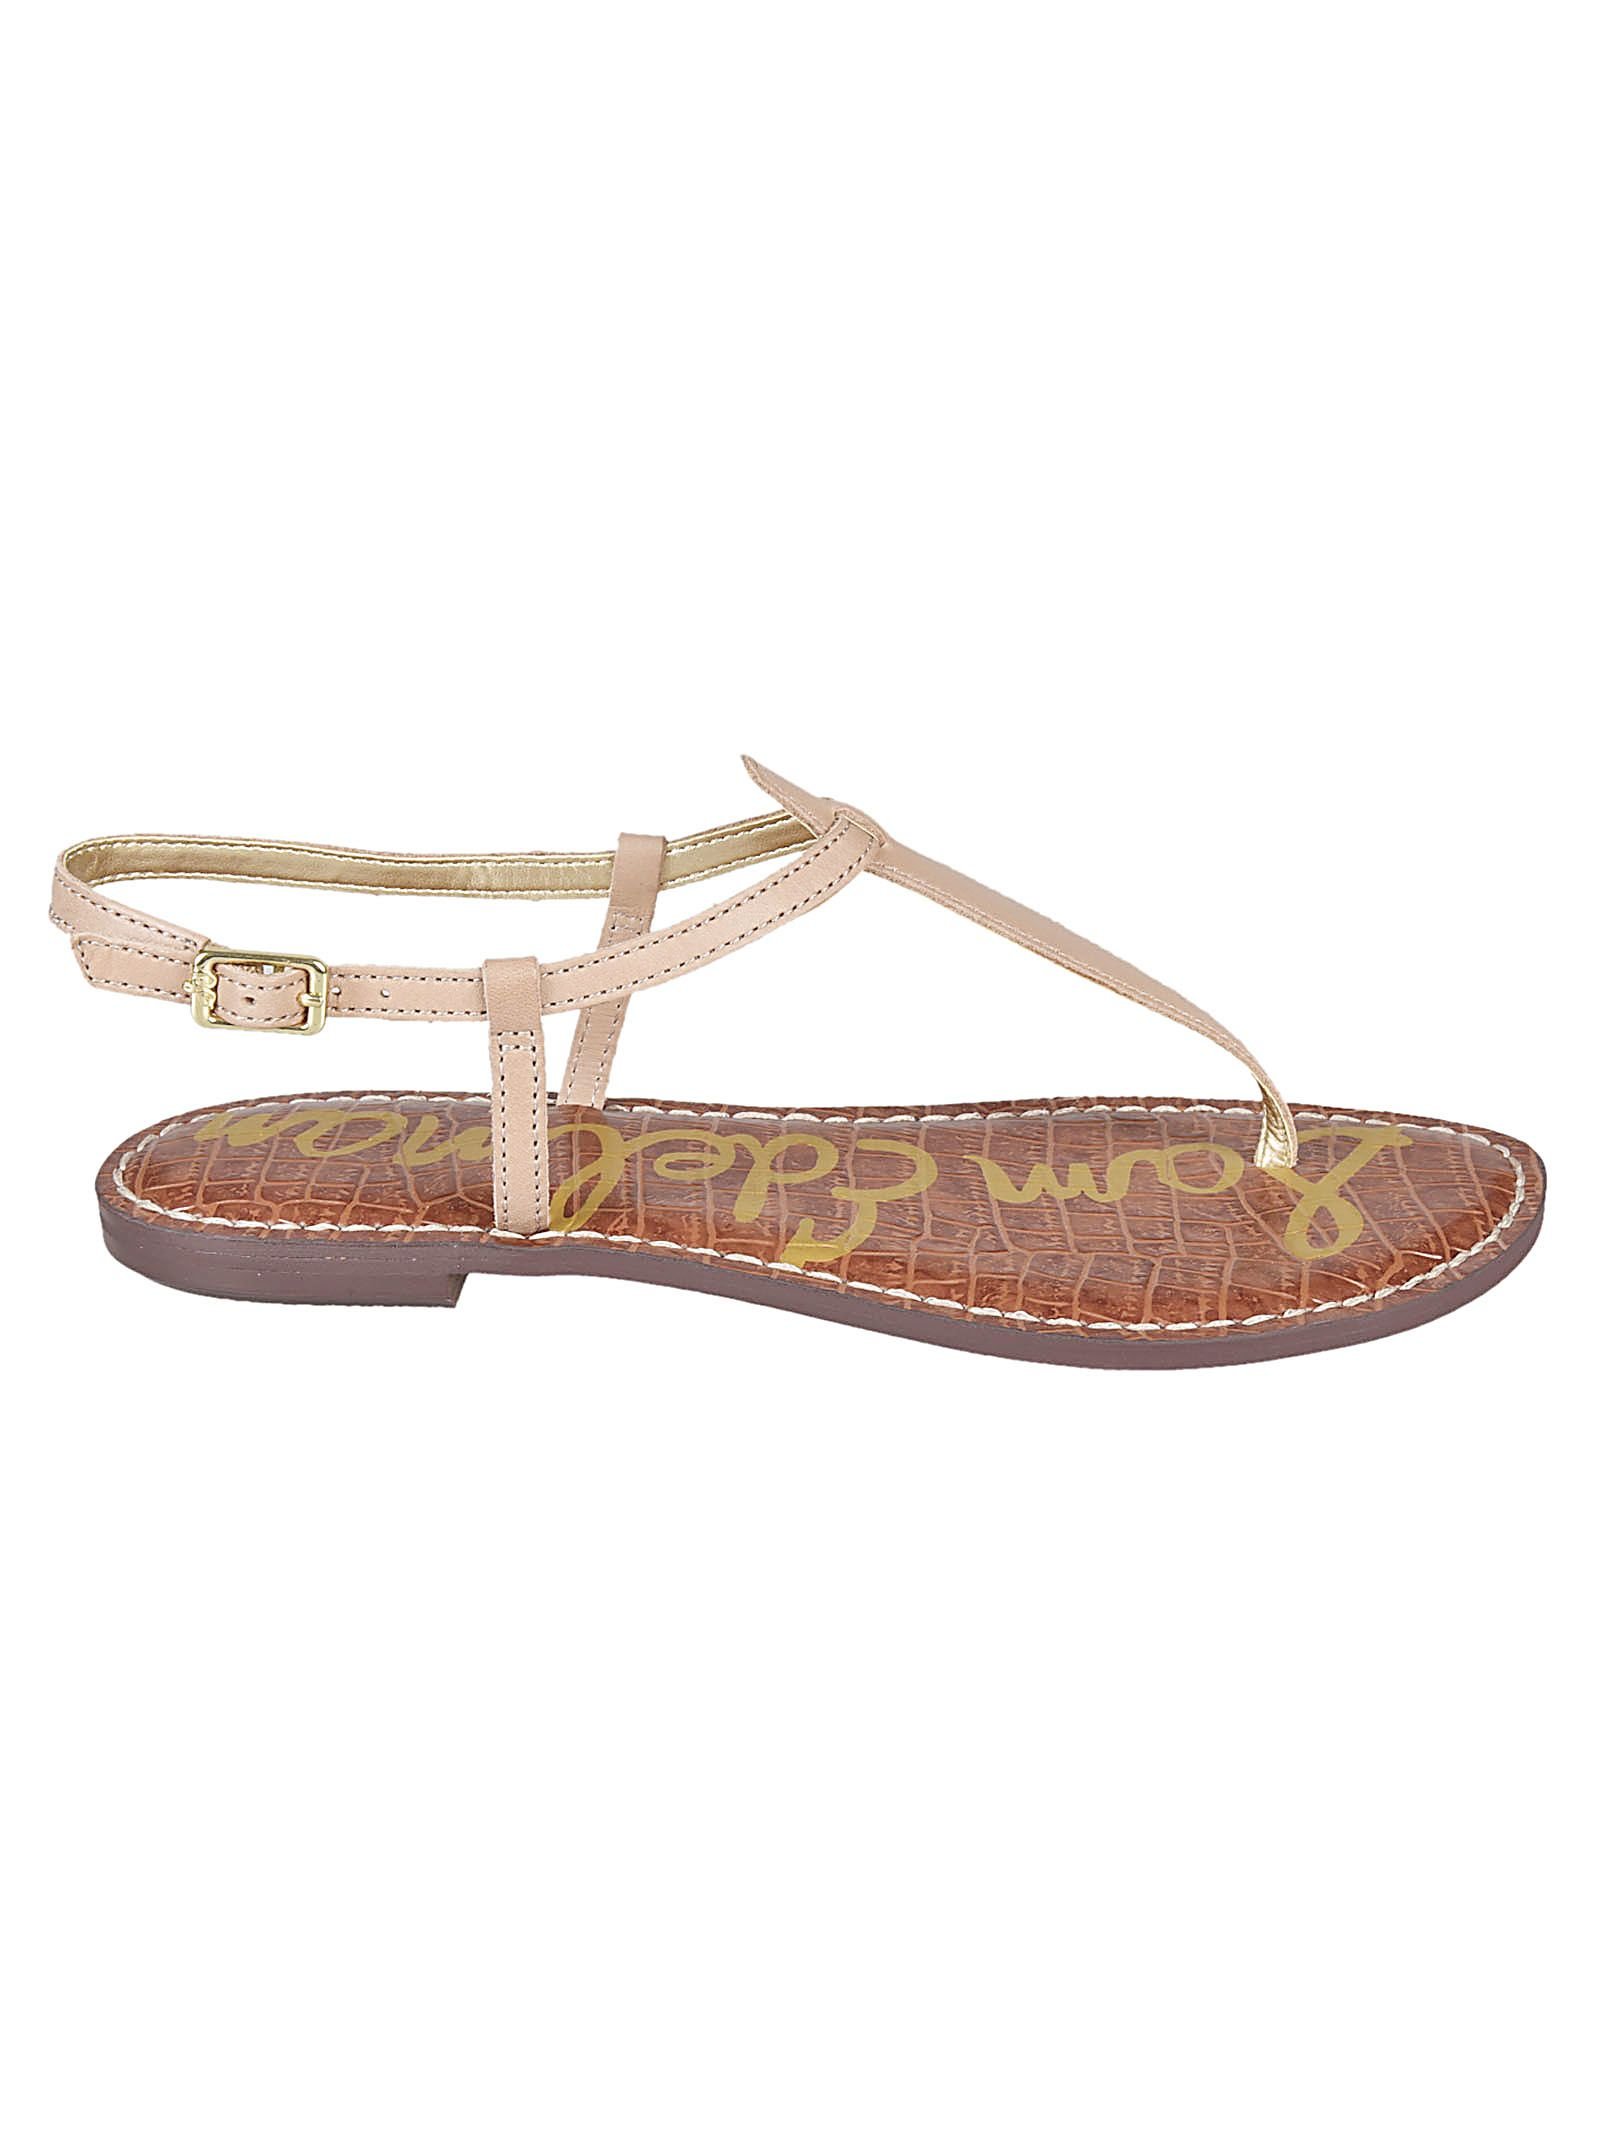 95816d6251c6 Sam Edelman Sam Edelman Gigi Flat Sandals - Almond - 10587752